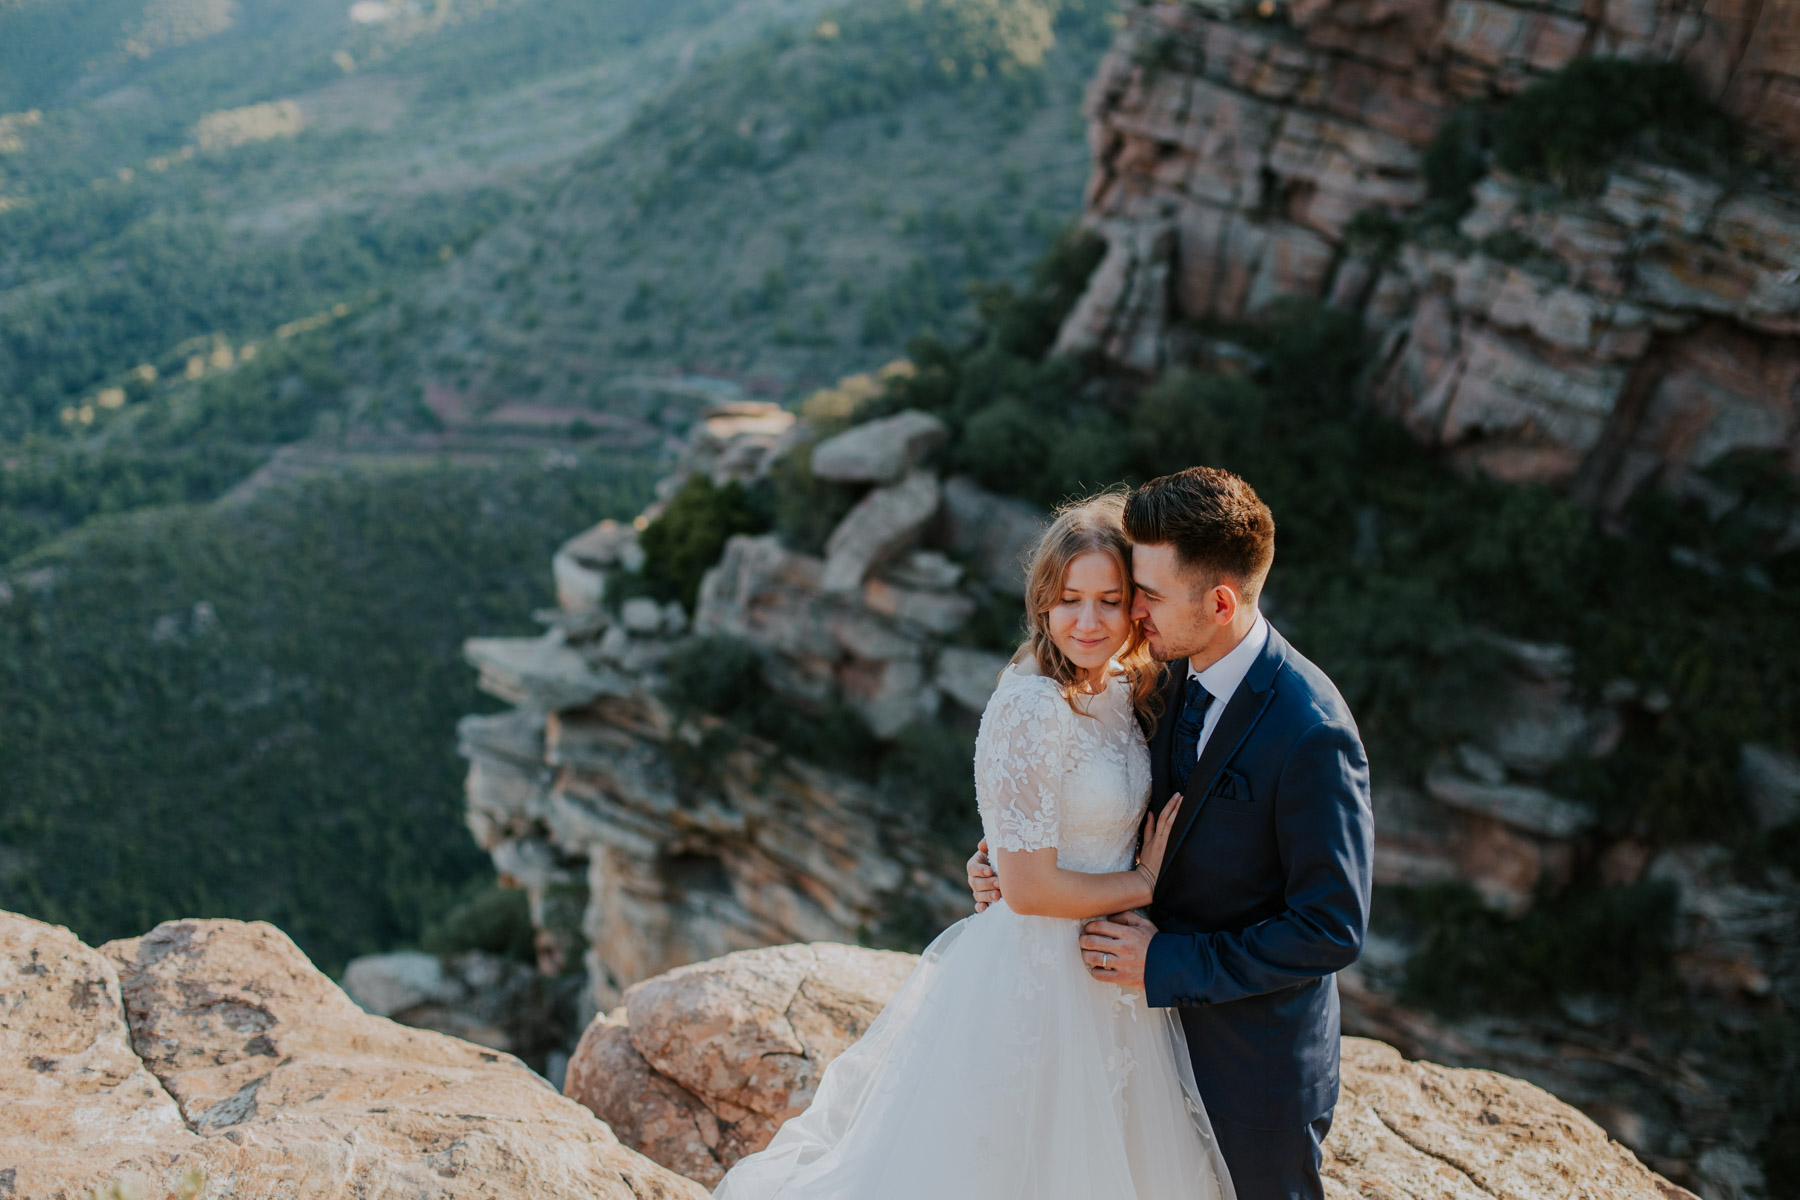 Foto de boda inspiradora pentecostal en Madrid tomada por Equalart